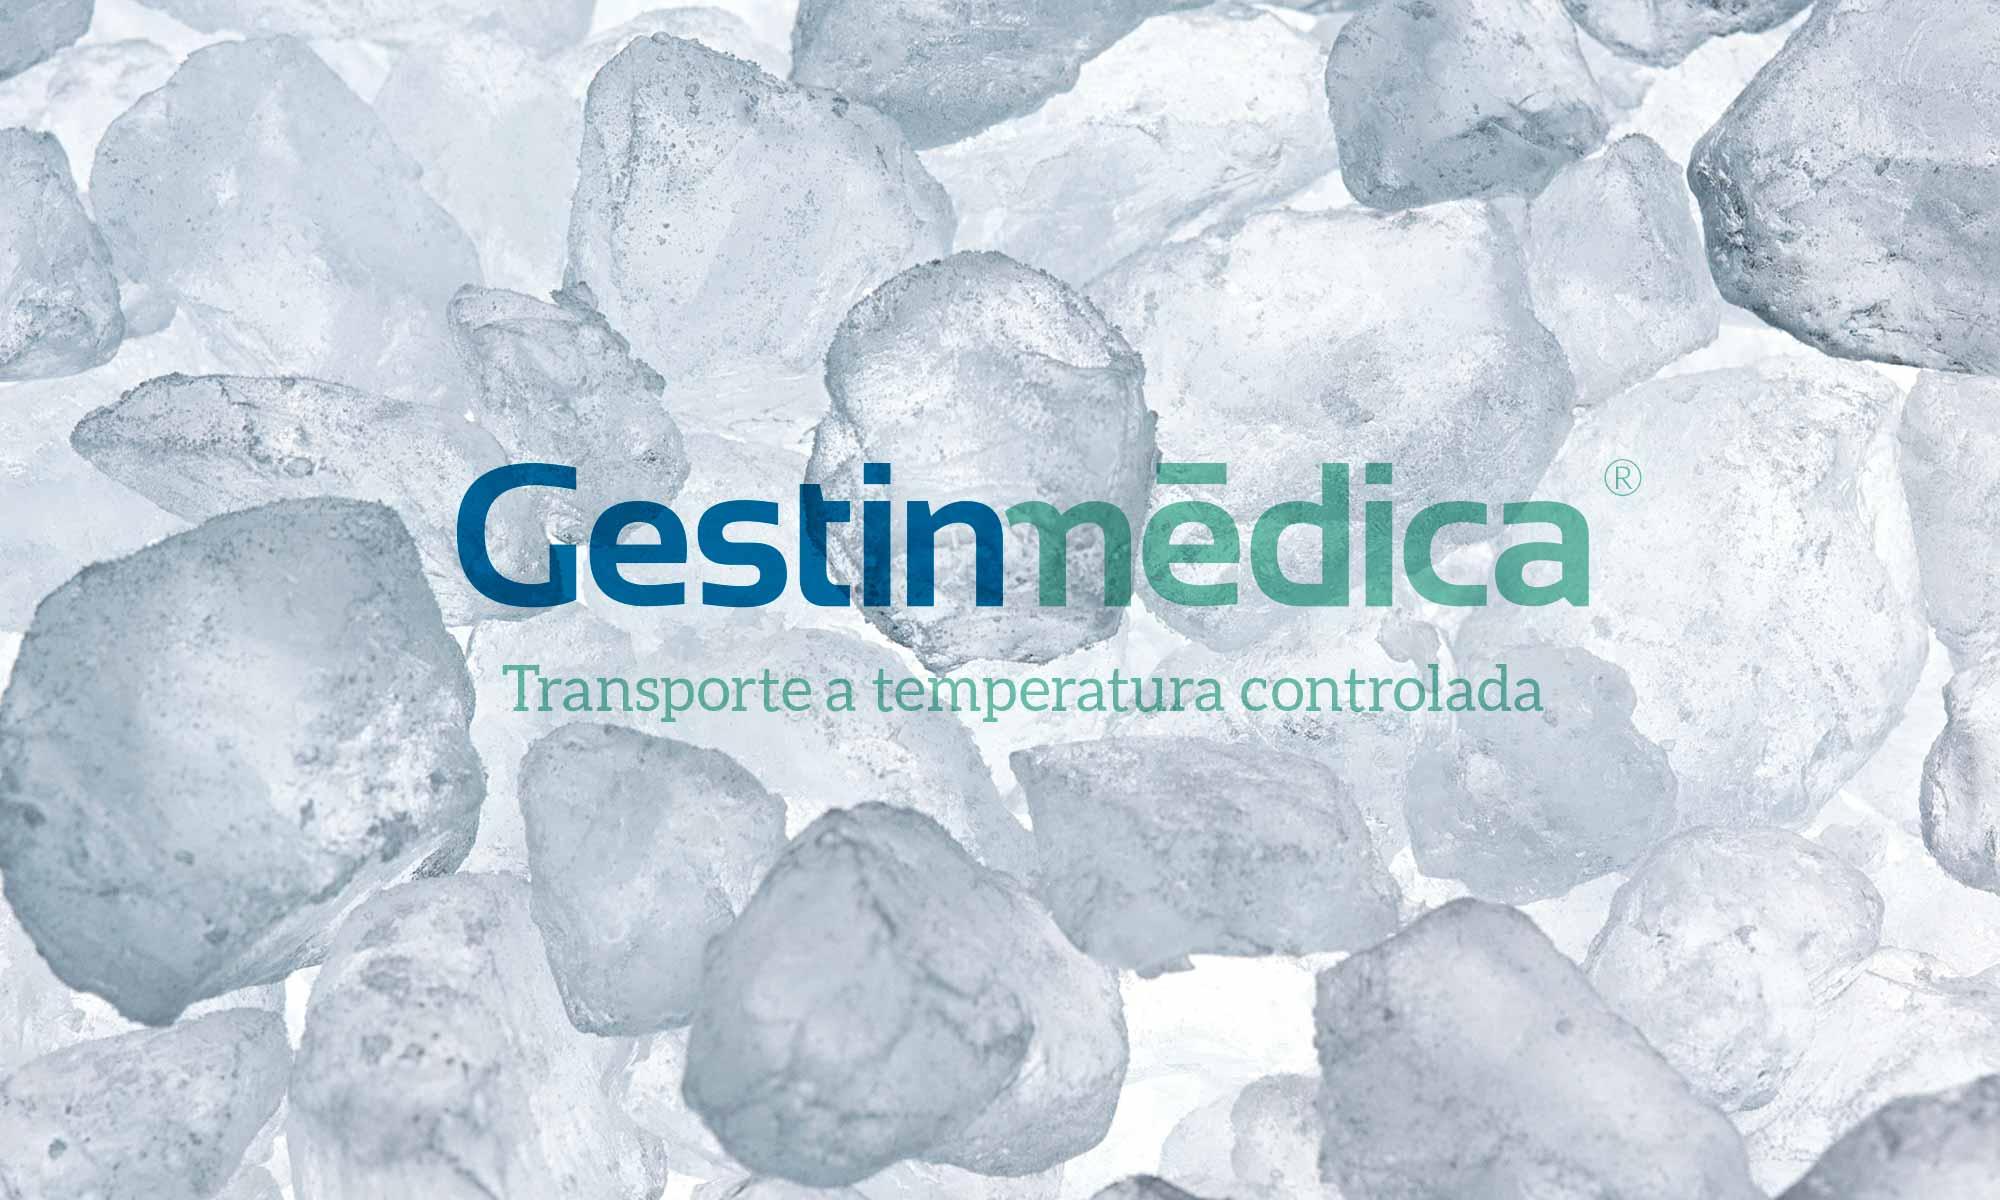 Gestinmedica-transporte-a-temperatura-controlada-BNR